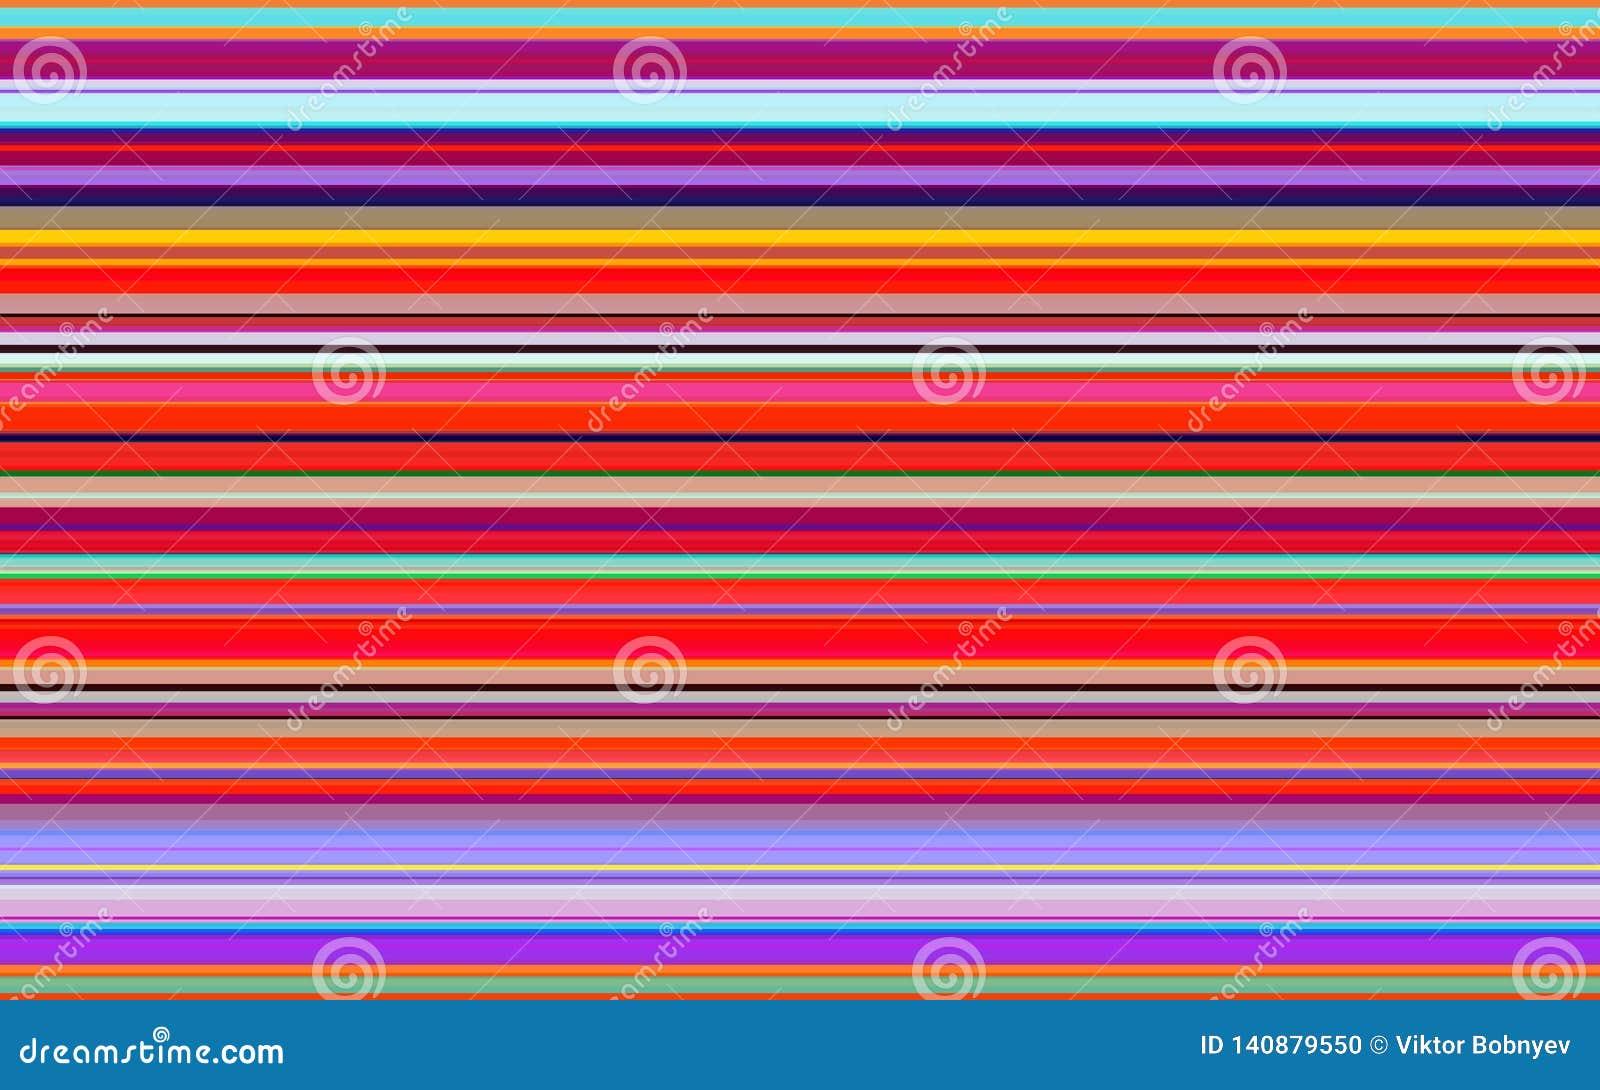 Color Lines Textile Background  Colorful Stripes Design